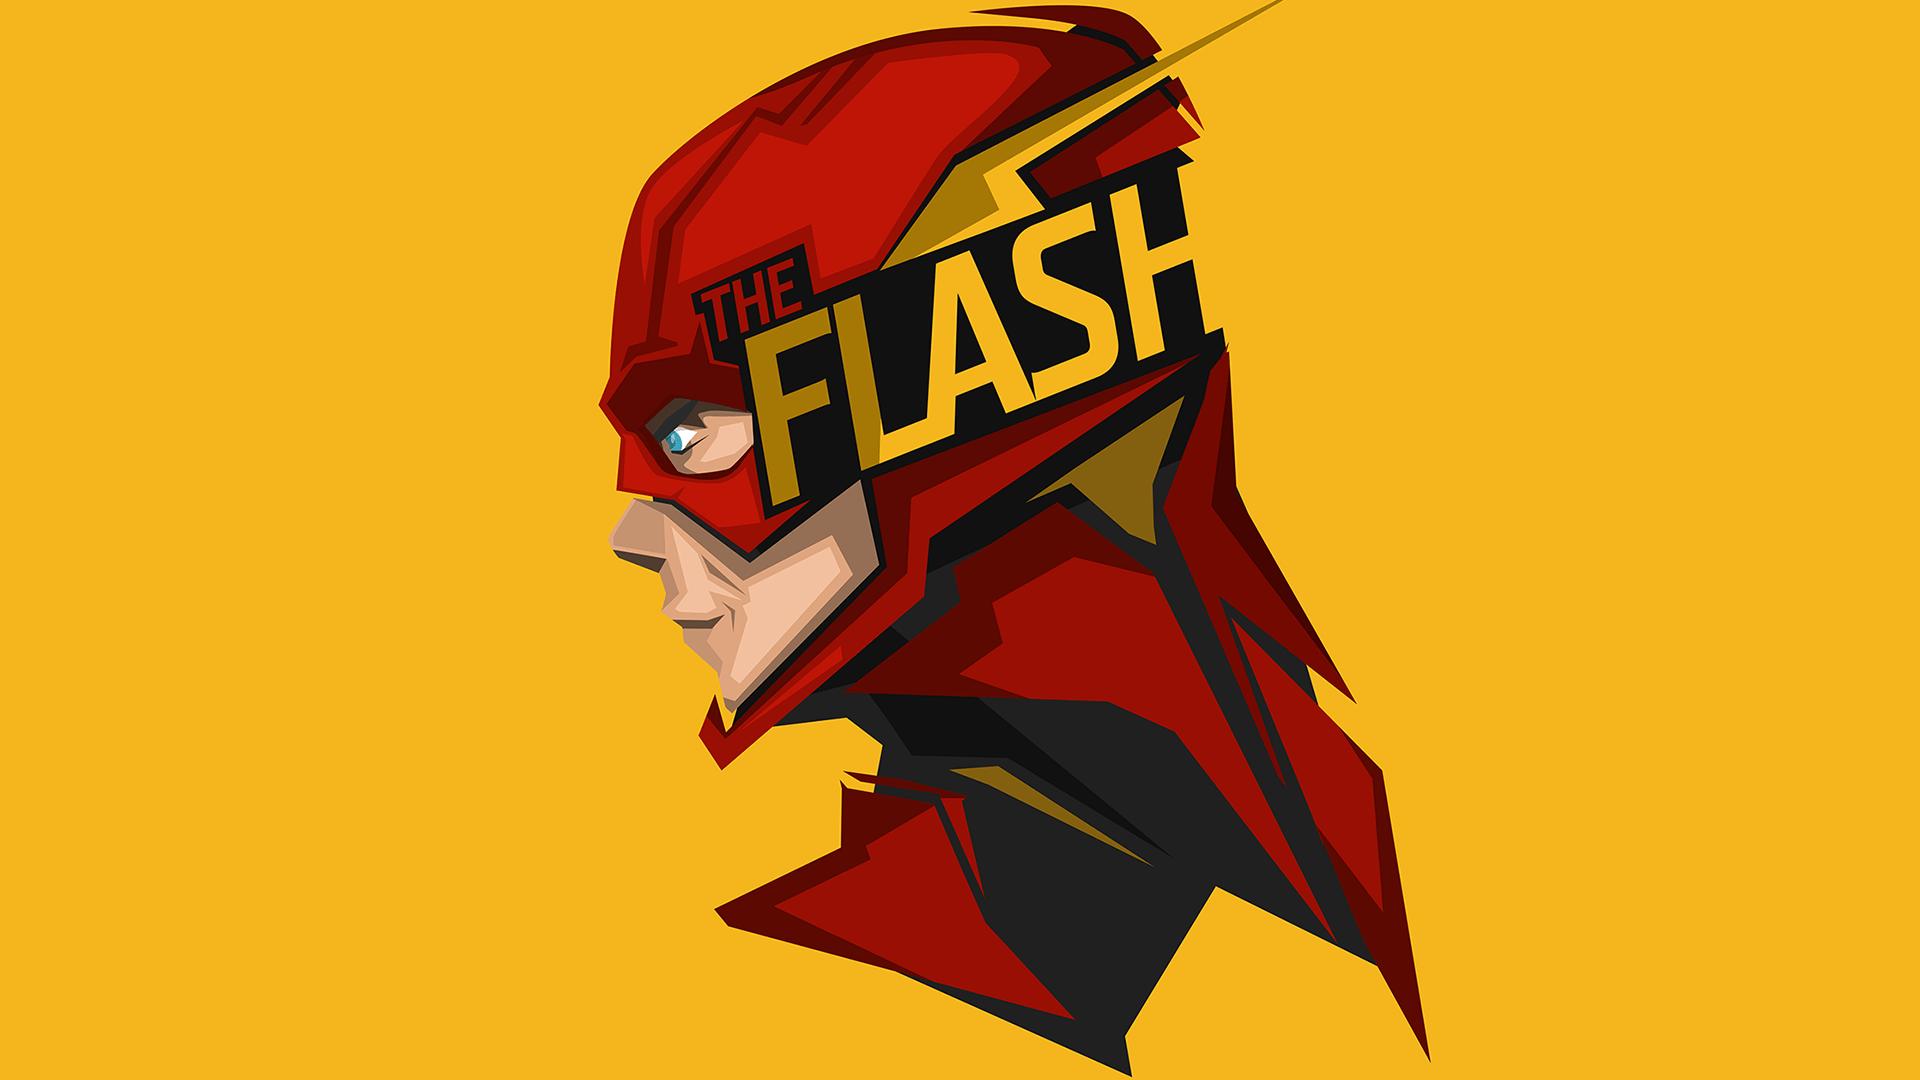 Resultado de imagem para flash wallpaper